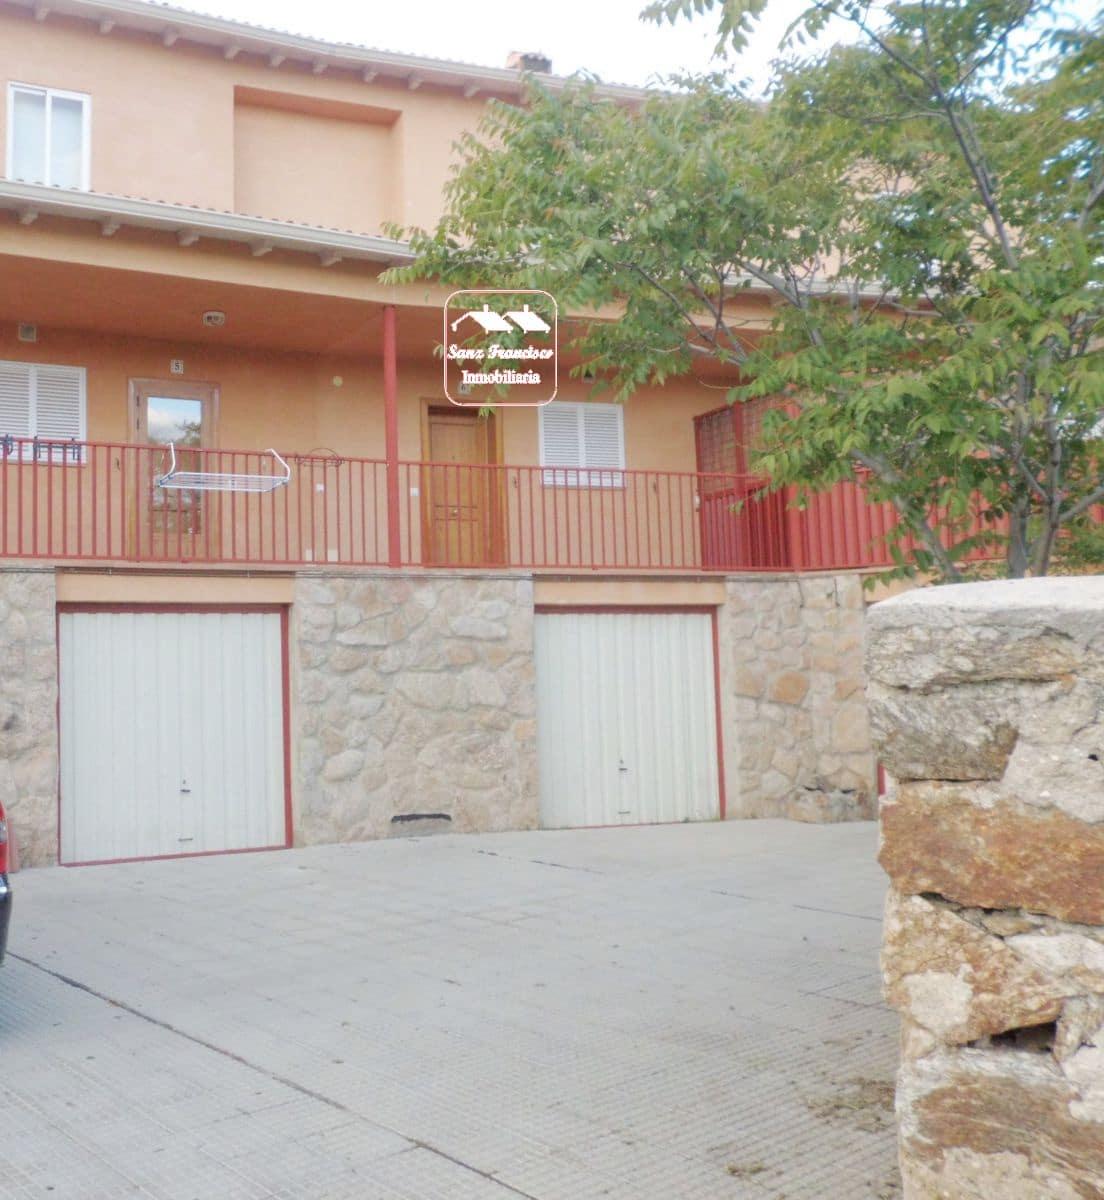 3 chambre Villa/Maison Mitoyenne à vendre à La Losa avec garage - 90 000 € (Ref: 3830161)